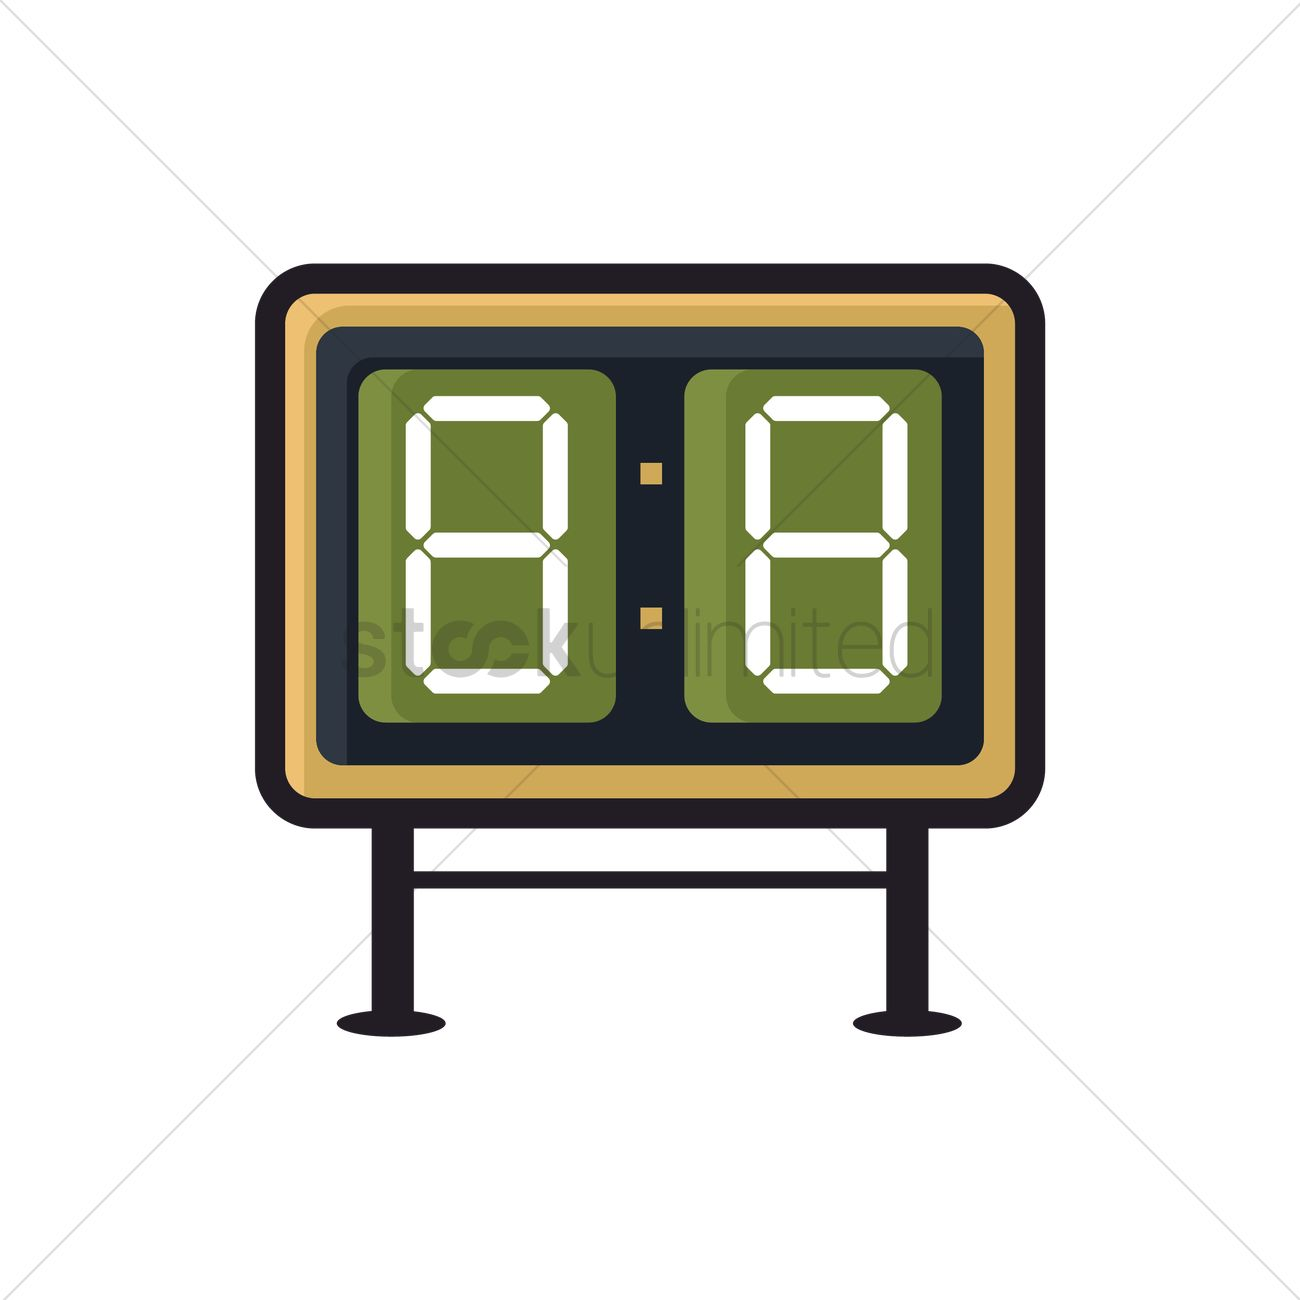 digital scoreboard vector image 1992144 stockunlimited rh stockunlimited com scorecard clip art scores clipart